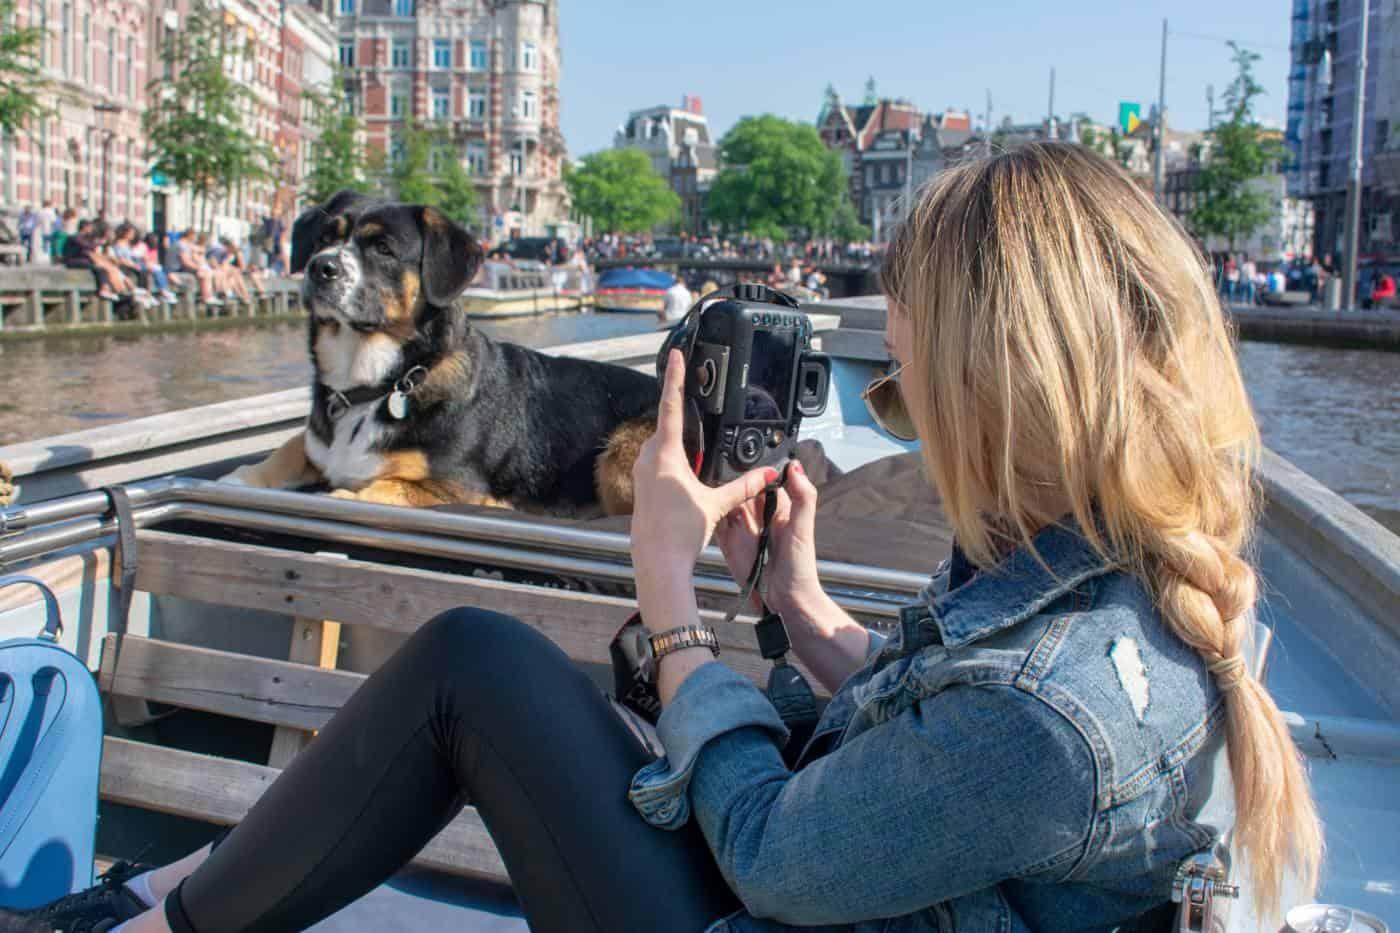 Camera gear for travel blogging and vlogging